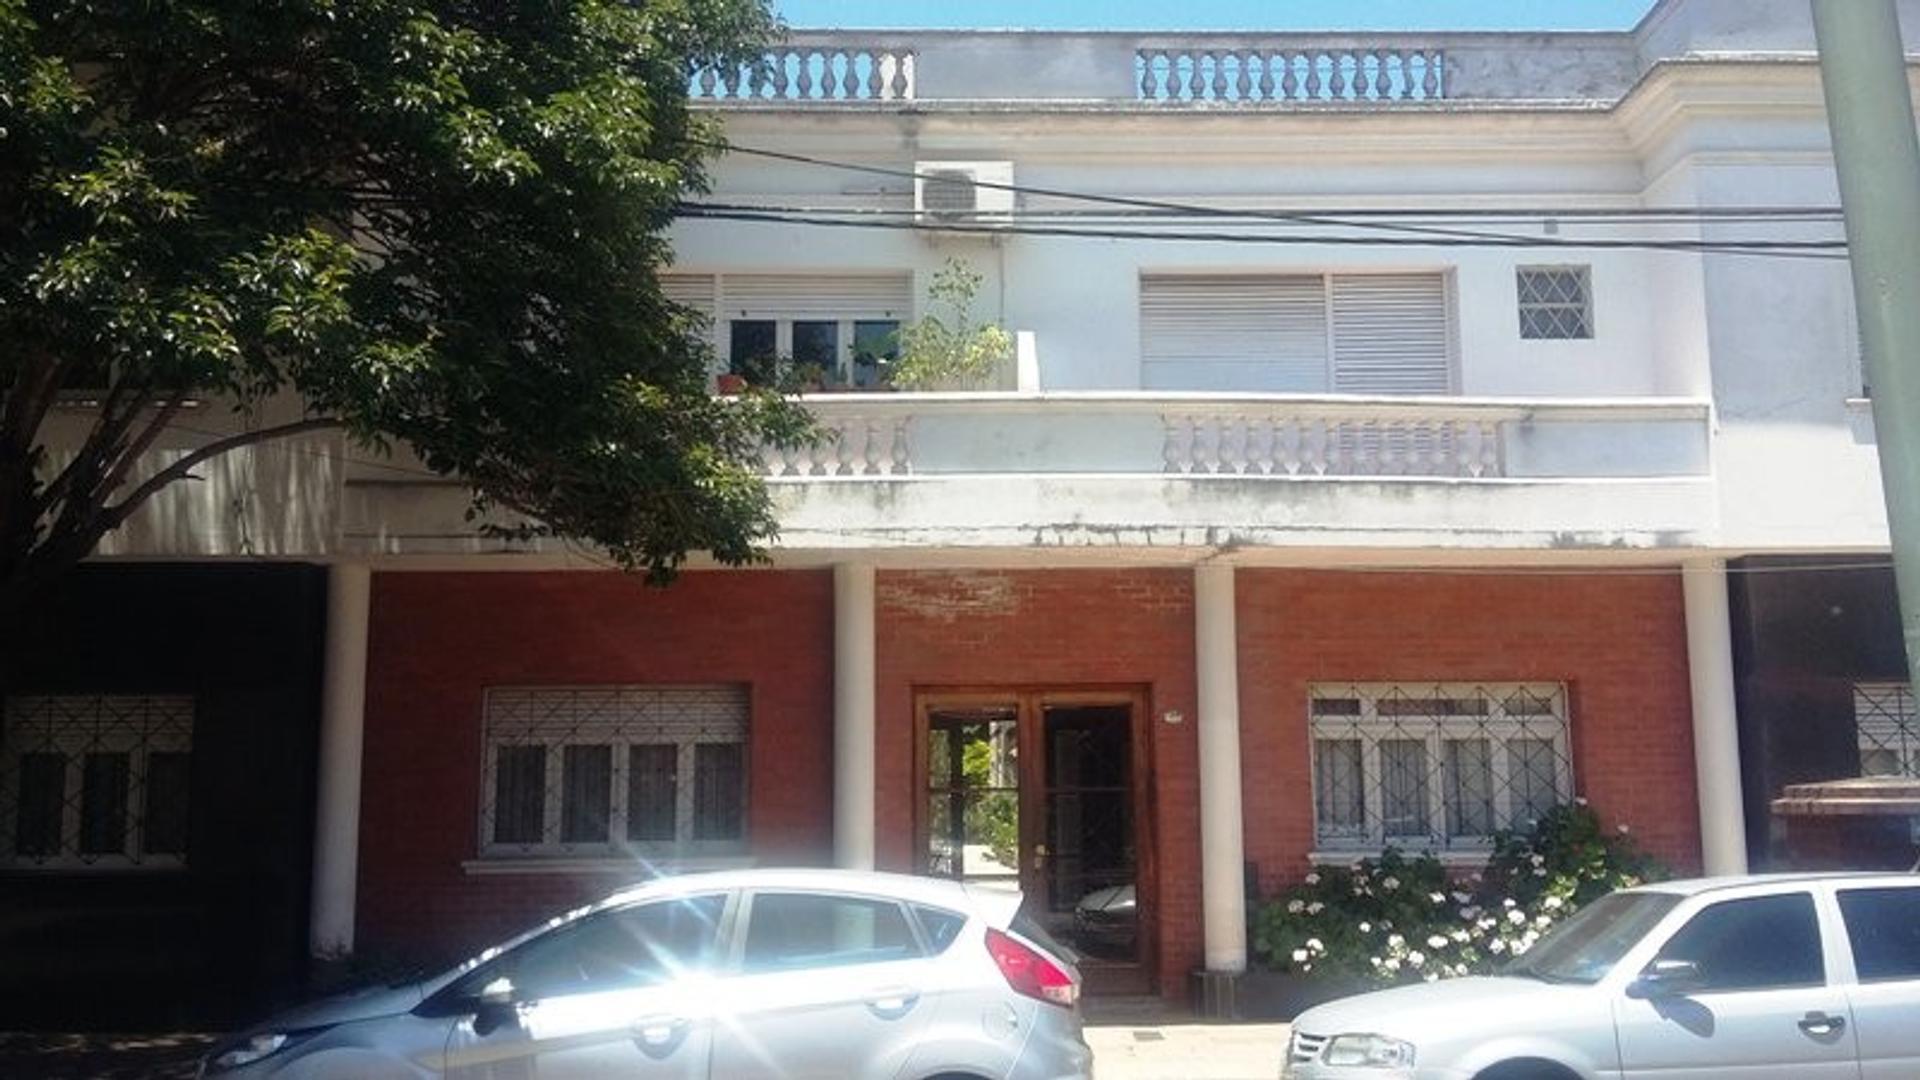 (PAS-PAS-1790) Departamento Tipo Casa - Venta - Argentina, Vicente López - RESERVADO  Arena...